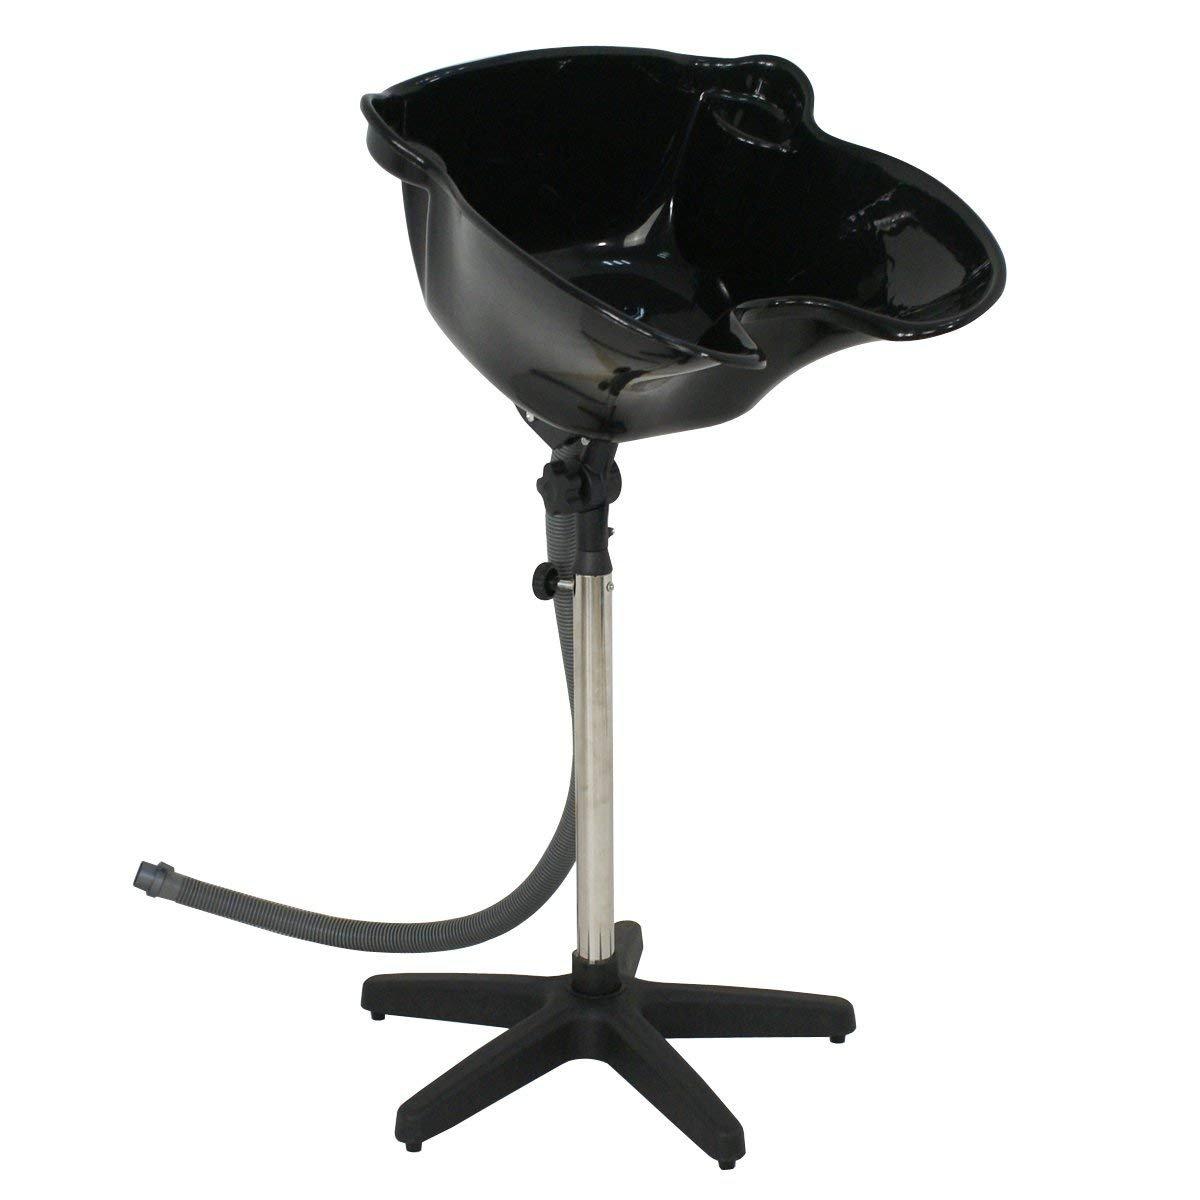 Portable Salon Deep Basin Shampoo Sink Hair Treatment Bowl with Drain Hose- Height Adjustable by Nova Microdermabrasion